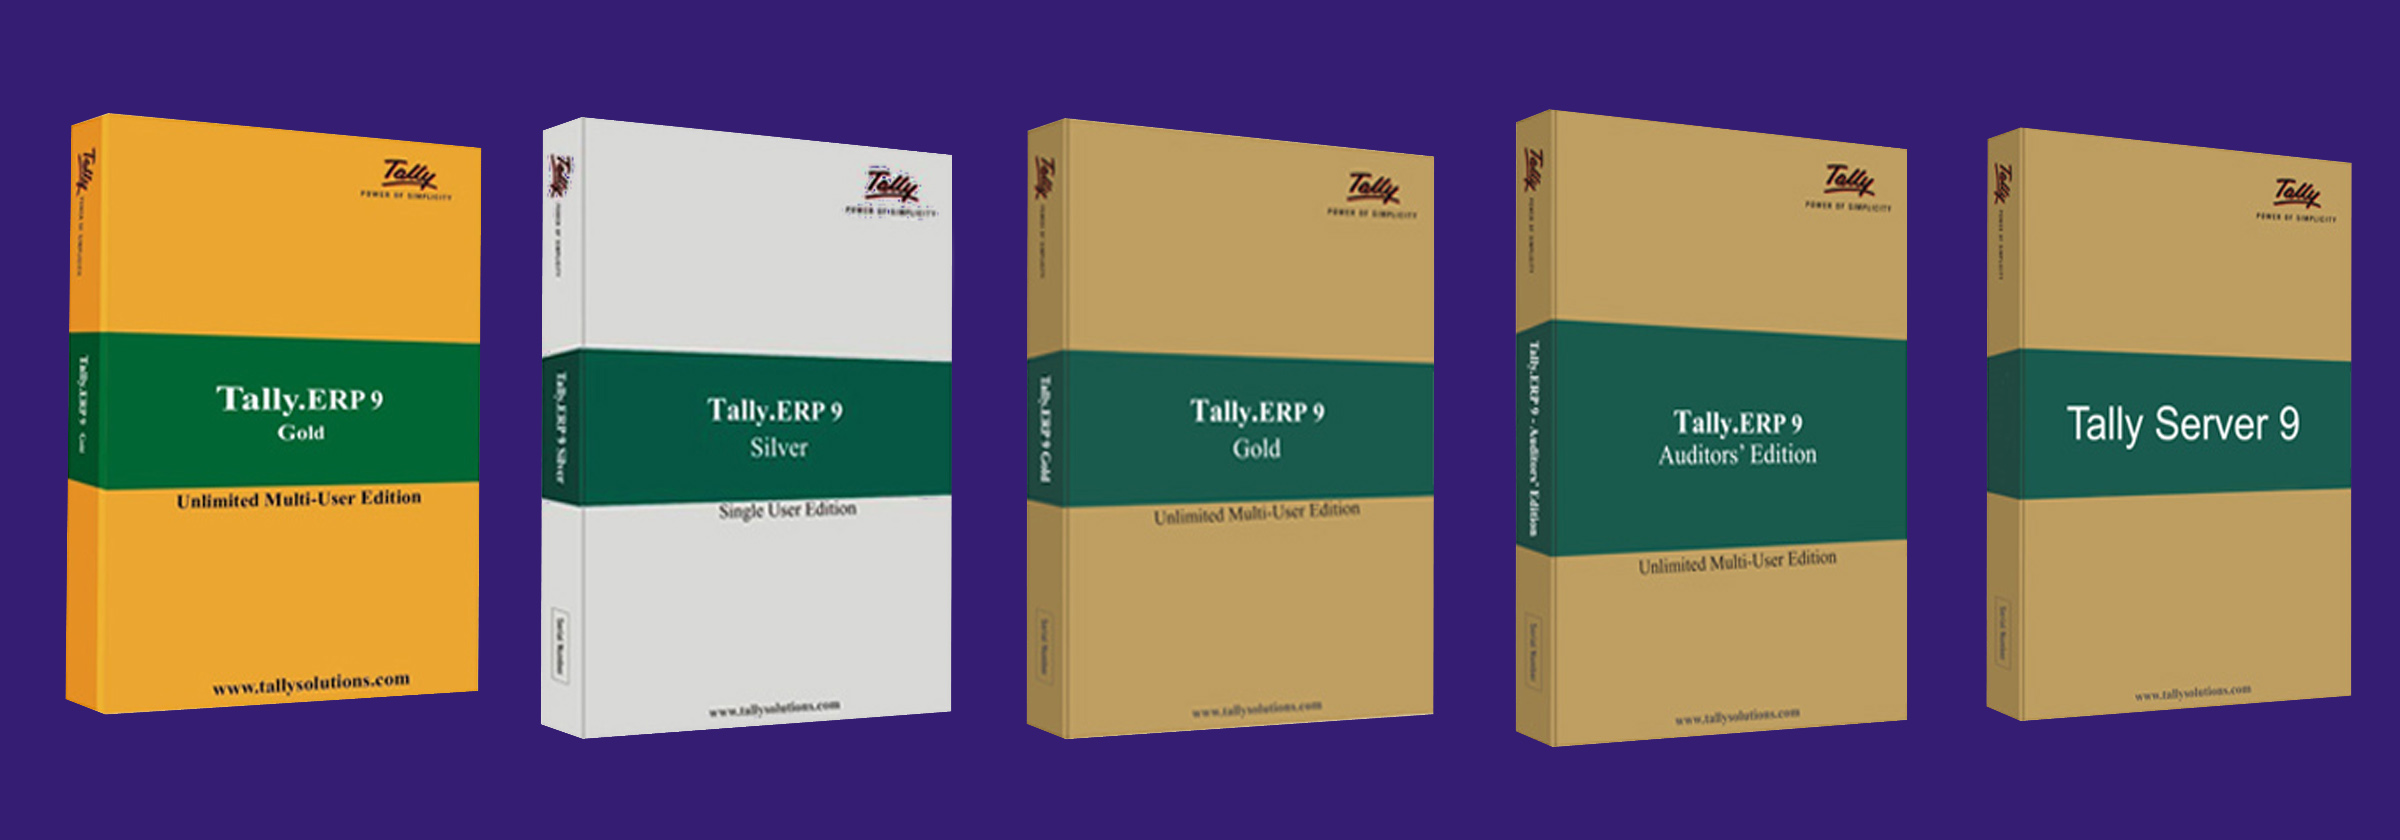 VISION TECH | Tally dealer in Tirupur | Tally Authorized partner